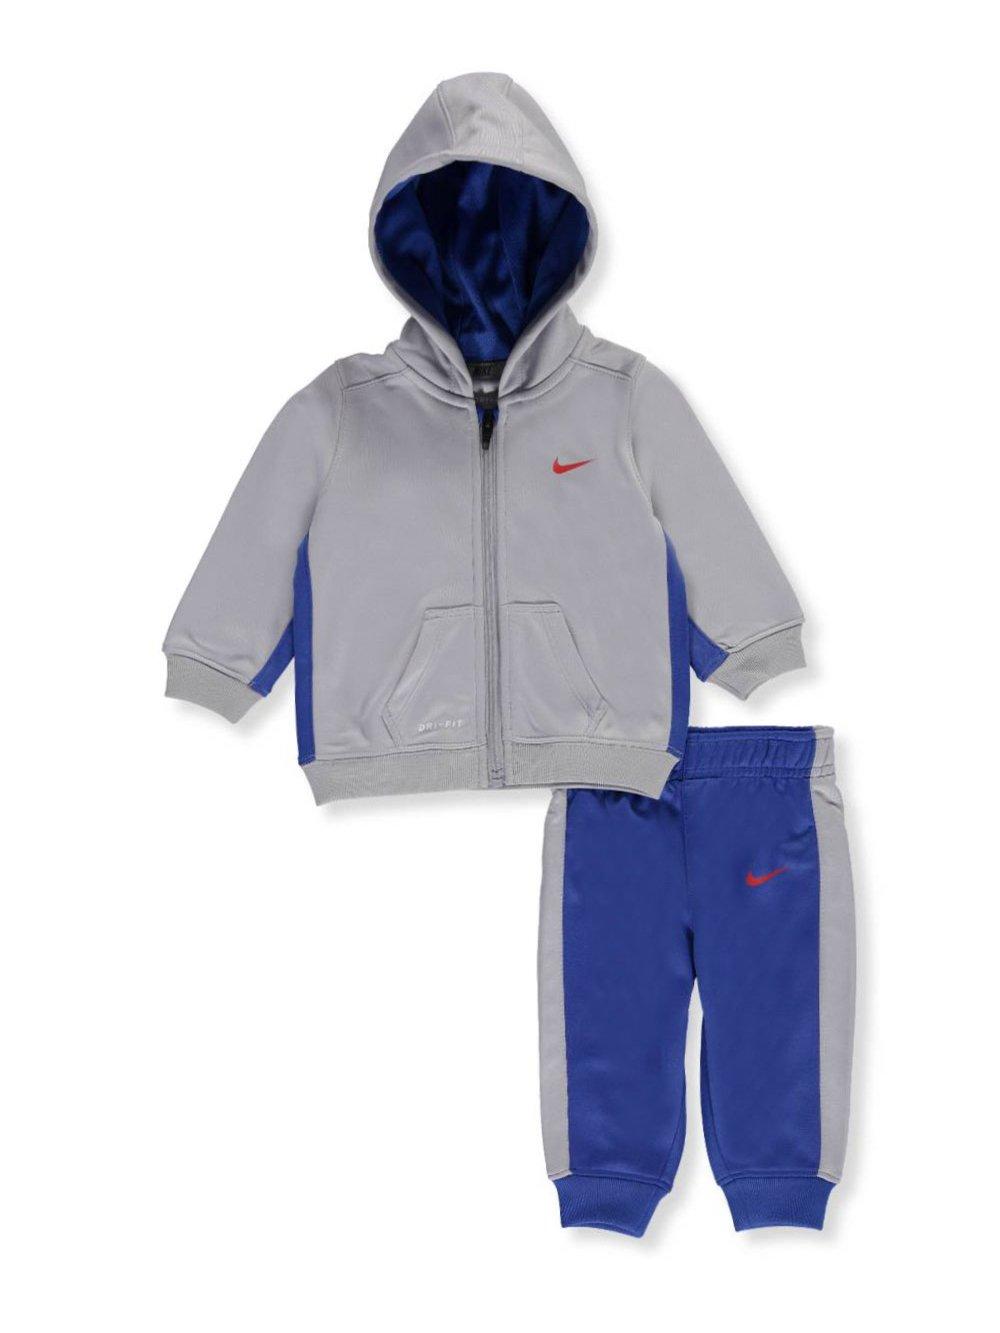 Nike Baby Boys' 2-Piece Therma Dri-Fit Sweatsuit - royal blue/gray, 6 - 9